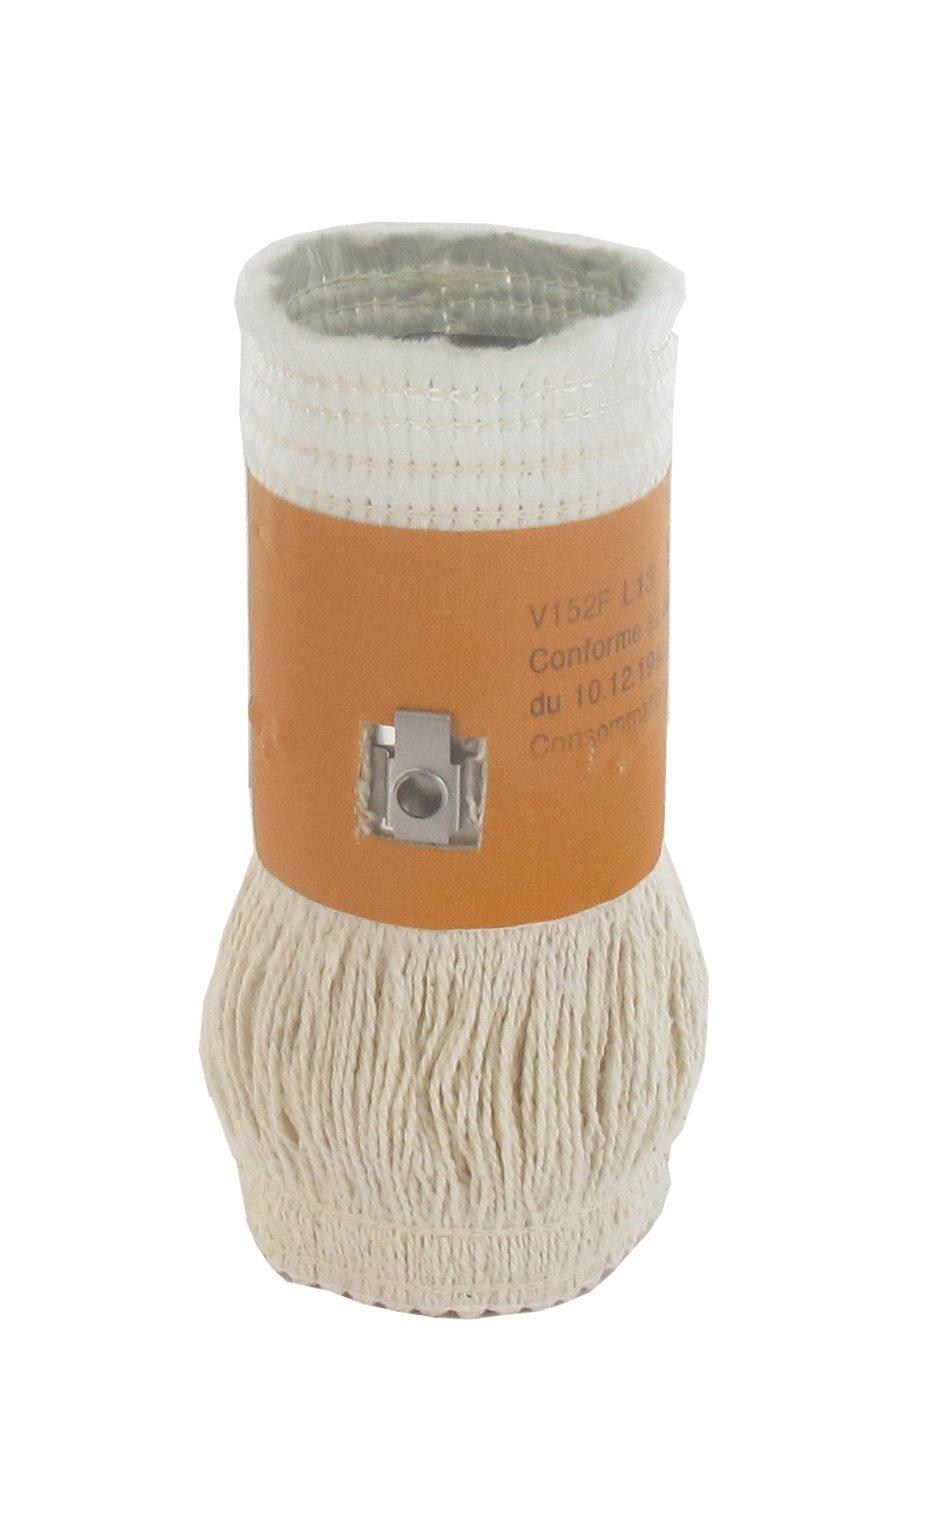 Greenstar 17465 - Adaptables estufa de queroseno mecha de sendai 330 nsh product image